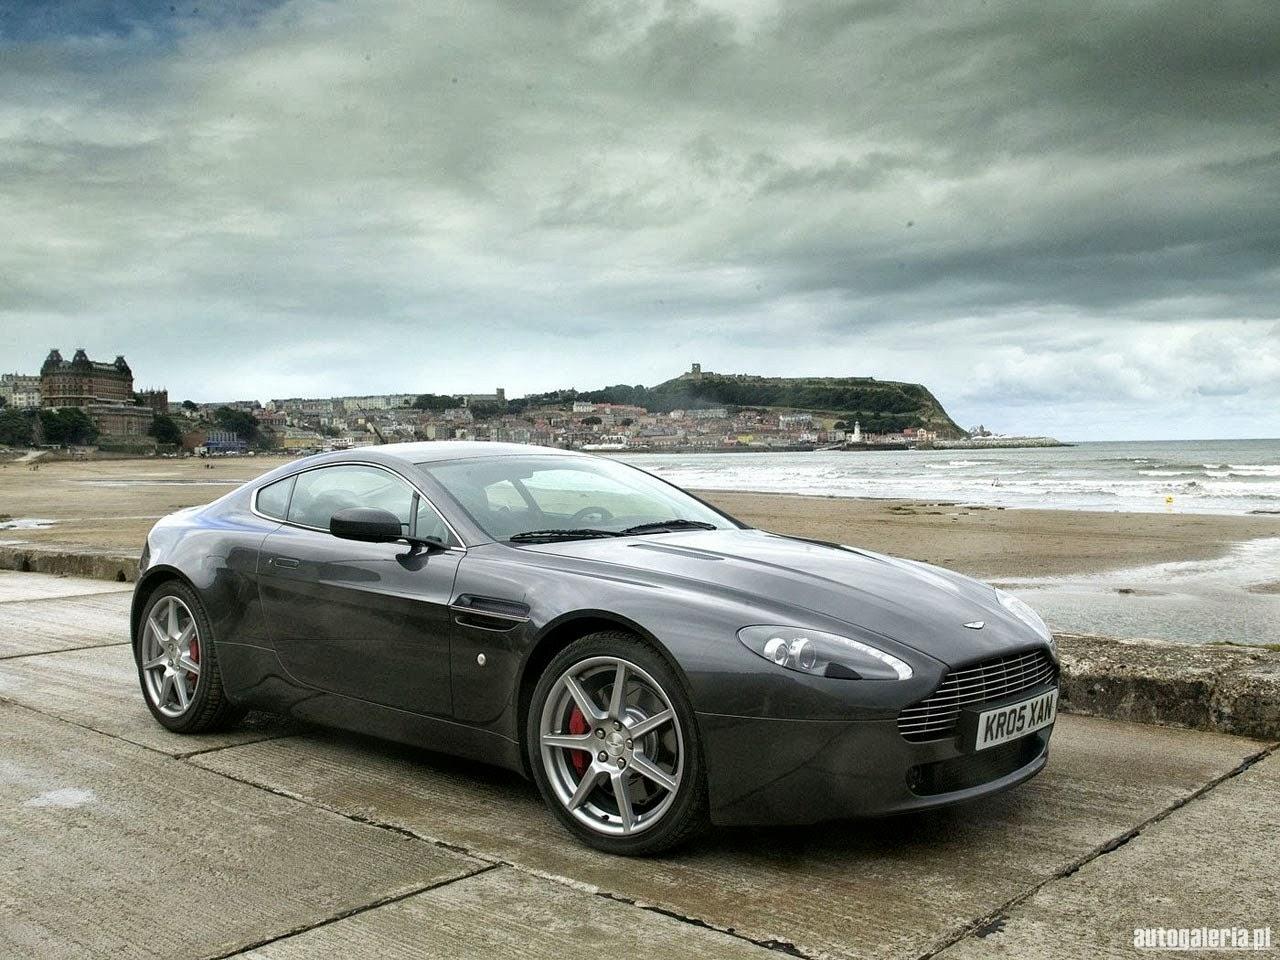 2014 Aston Martin V8 Vantage Sport Exotic Coupe